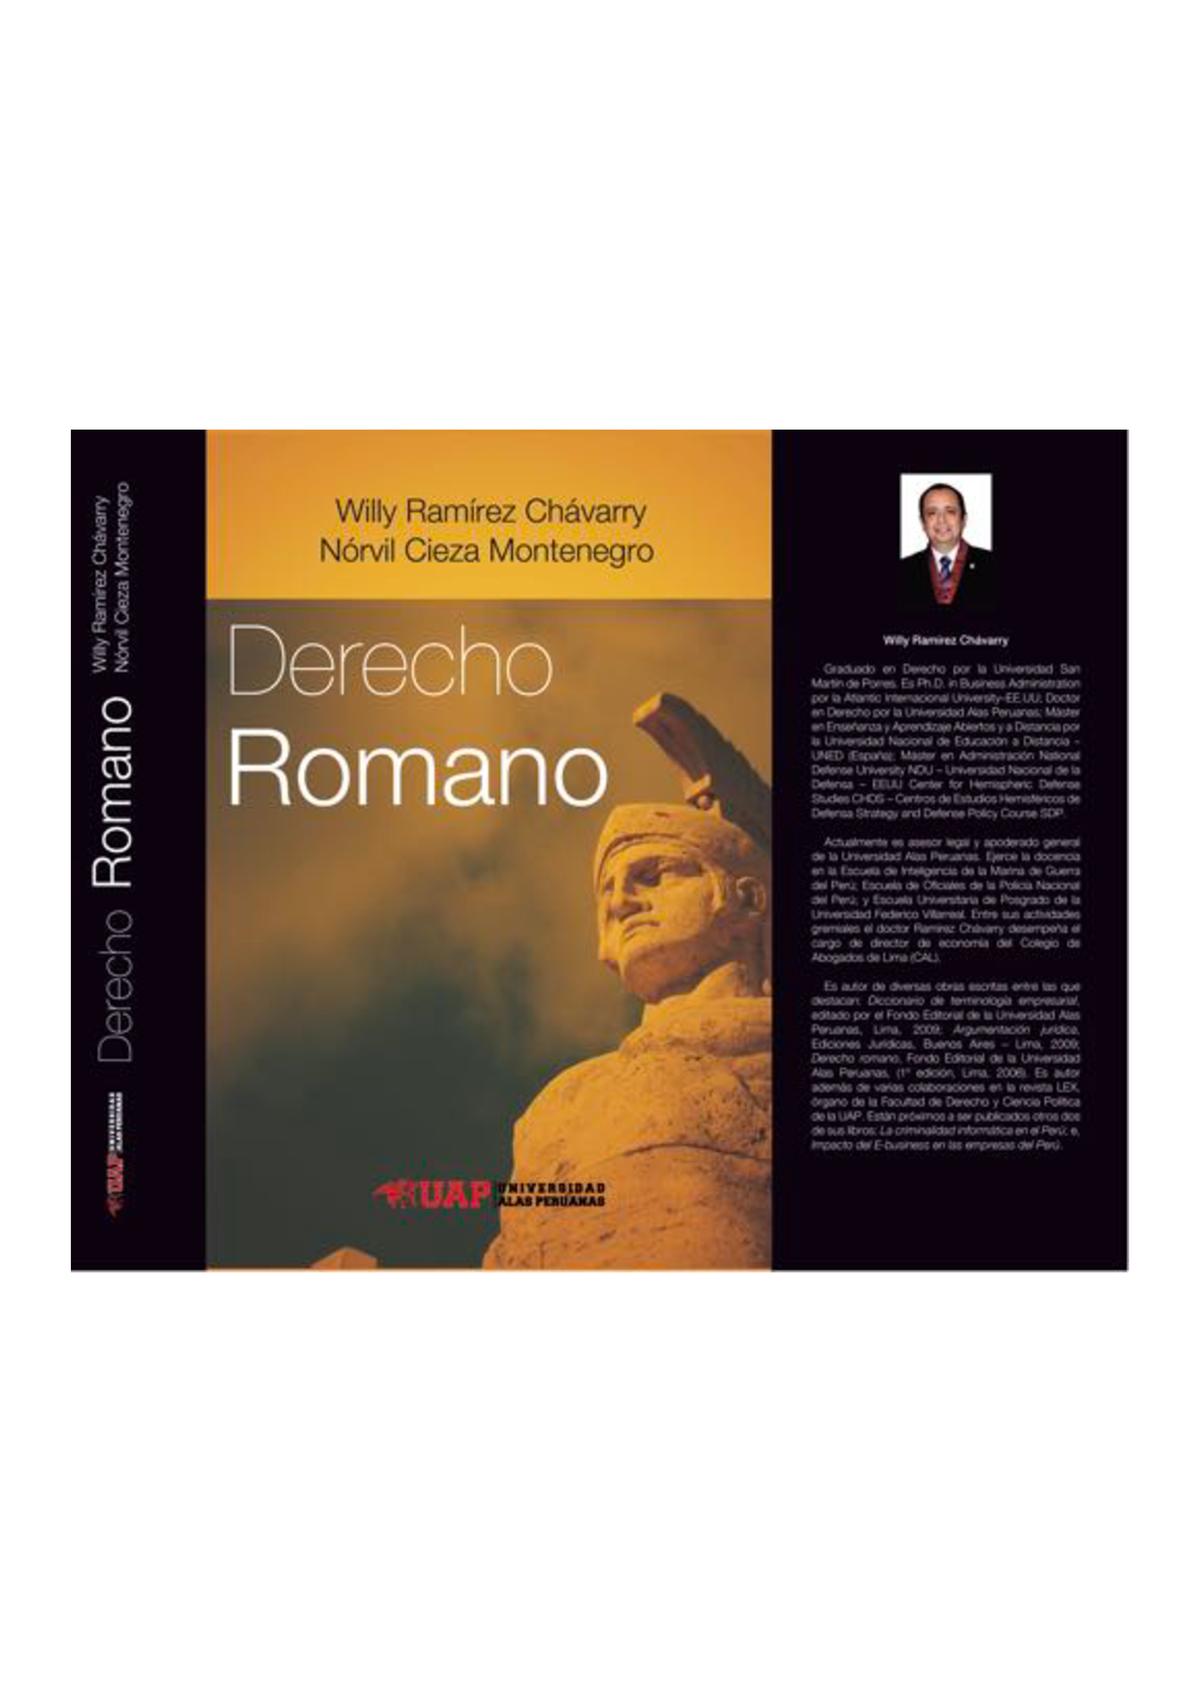 Matrimonio Romano Requisitos : Derecho romano derecho romano studocu